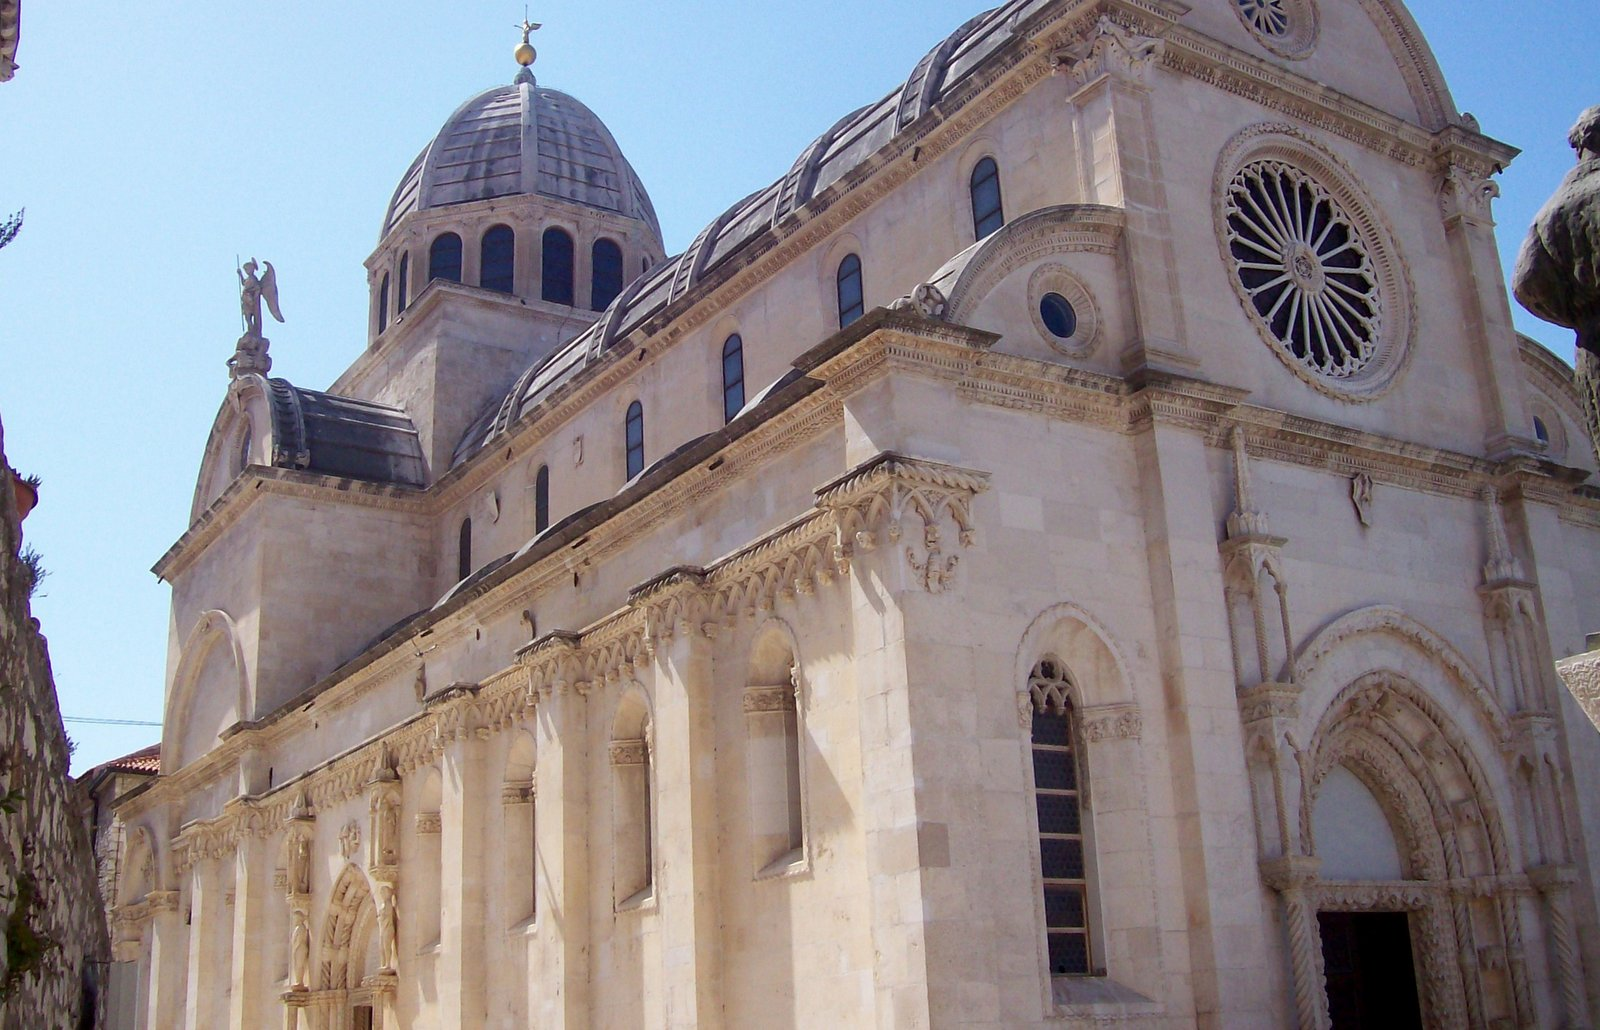 Dom zu Sibenik in Dalmatien